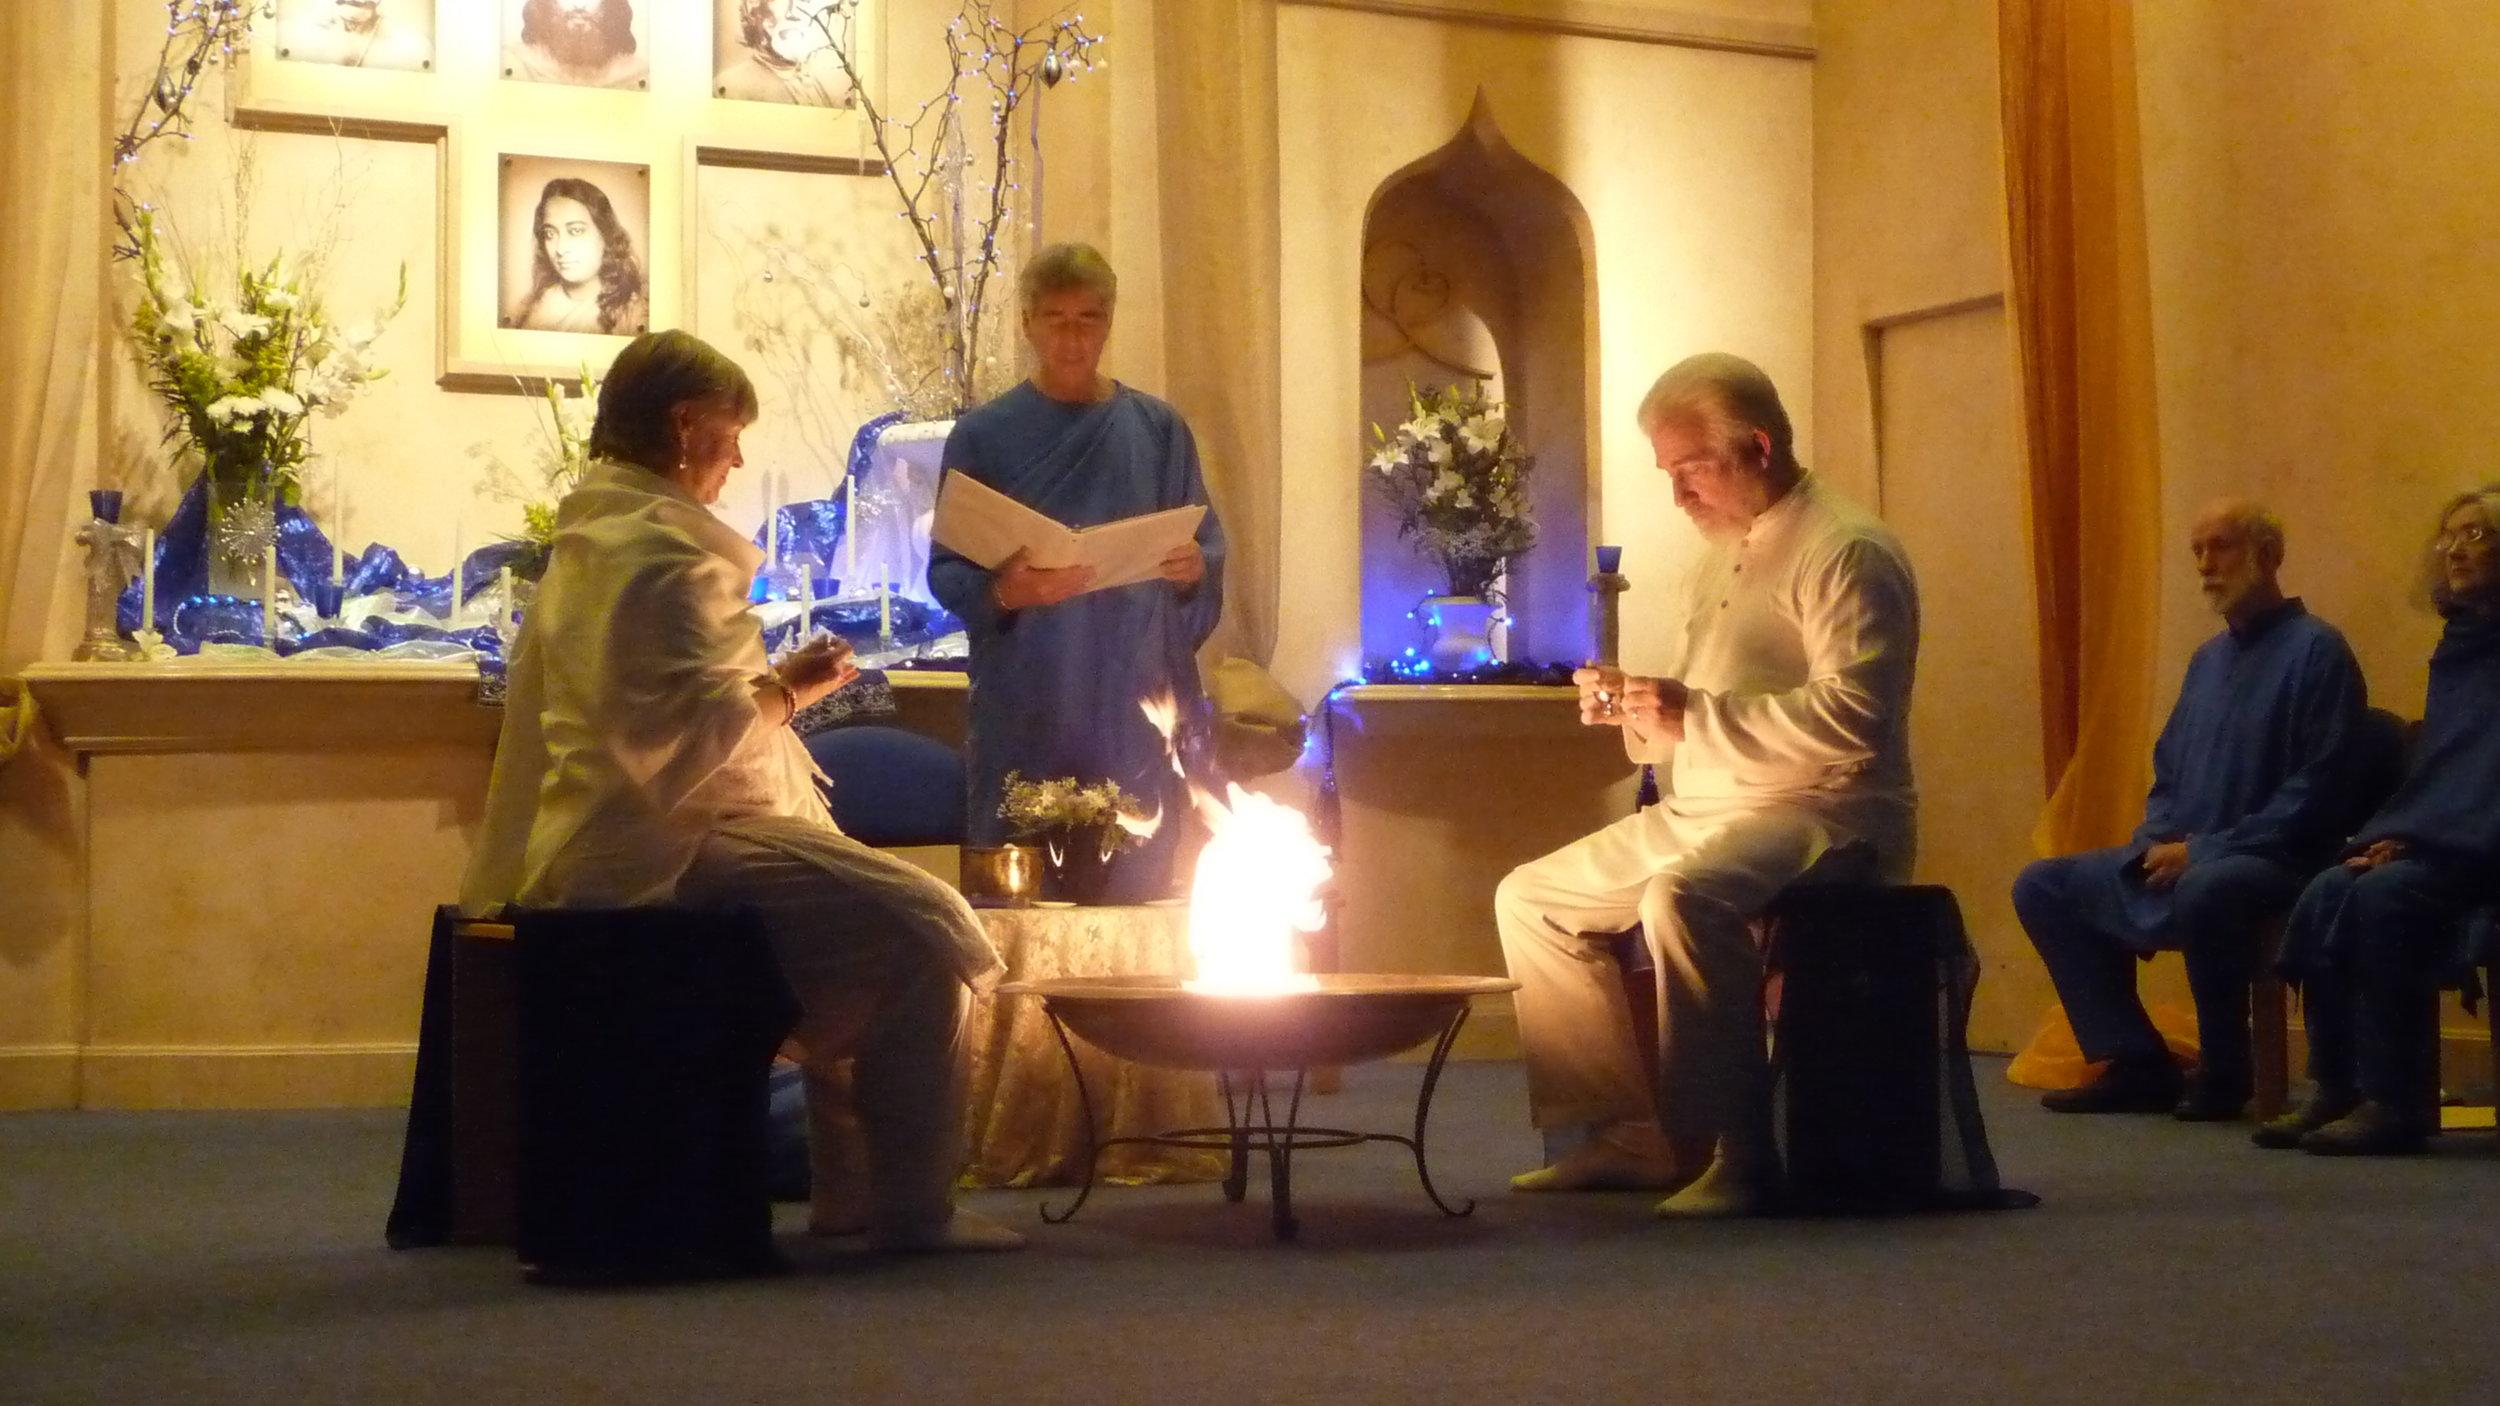 2012 initiation: Lahari and Biraj taking Nayaswami vows